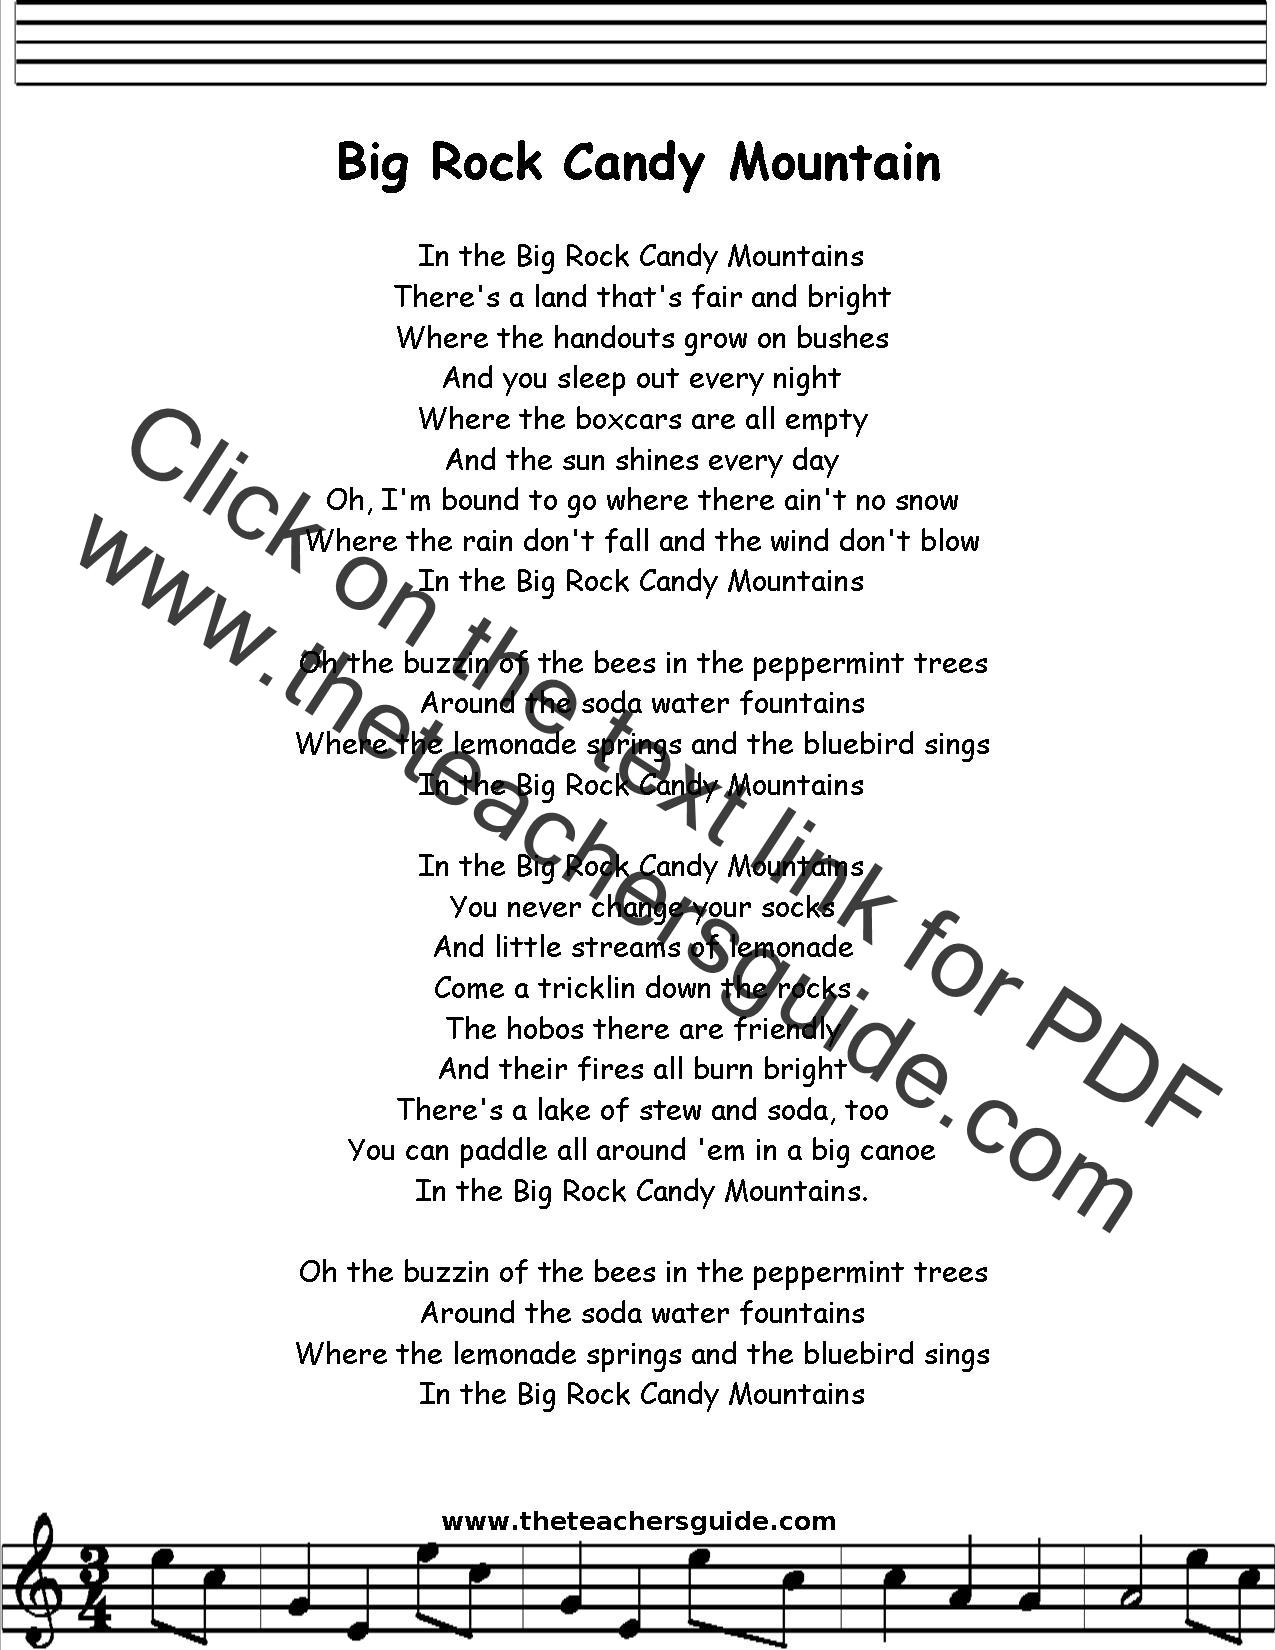 Big Rock Candy Mountain Lyrics Printout Midi And Video